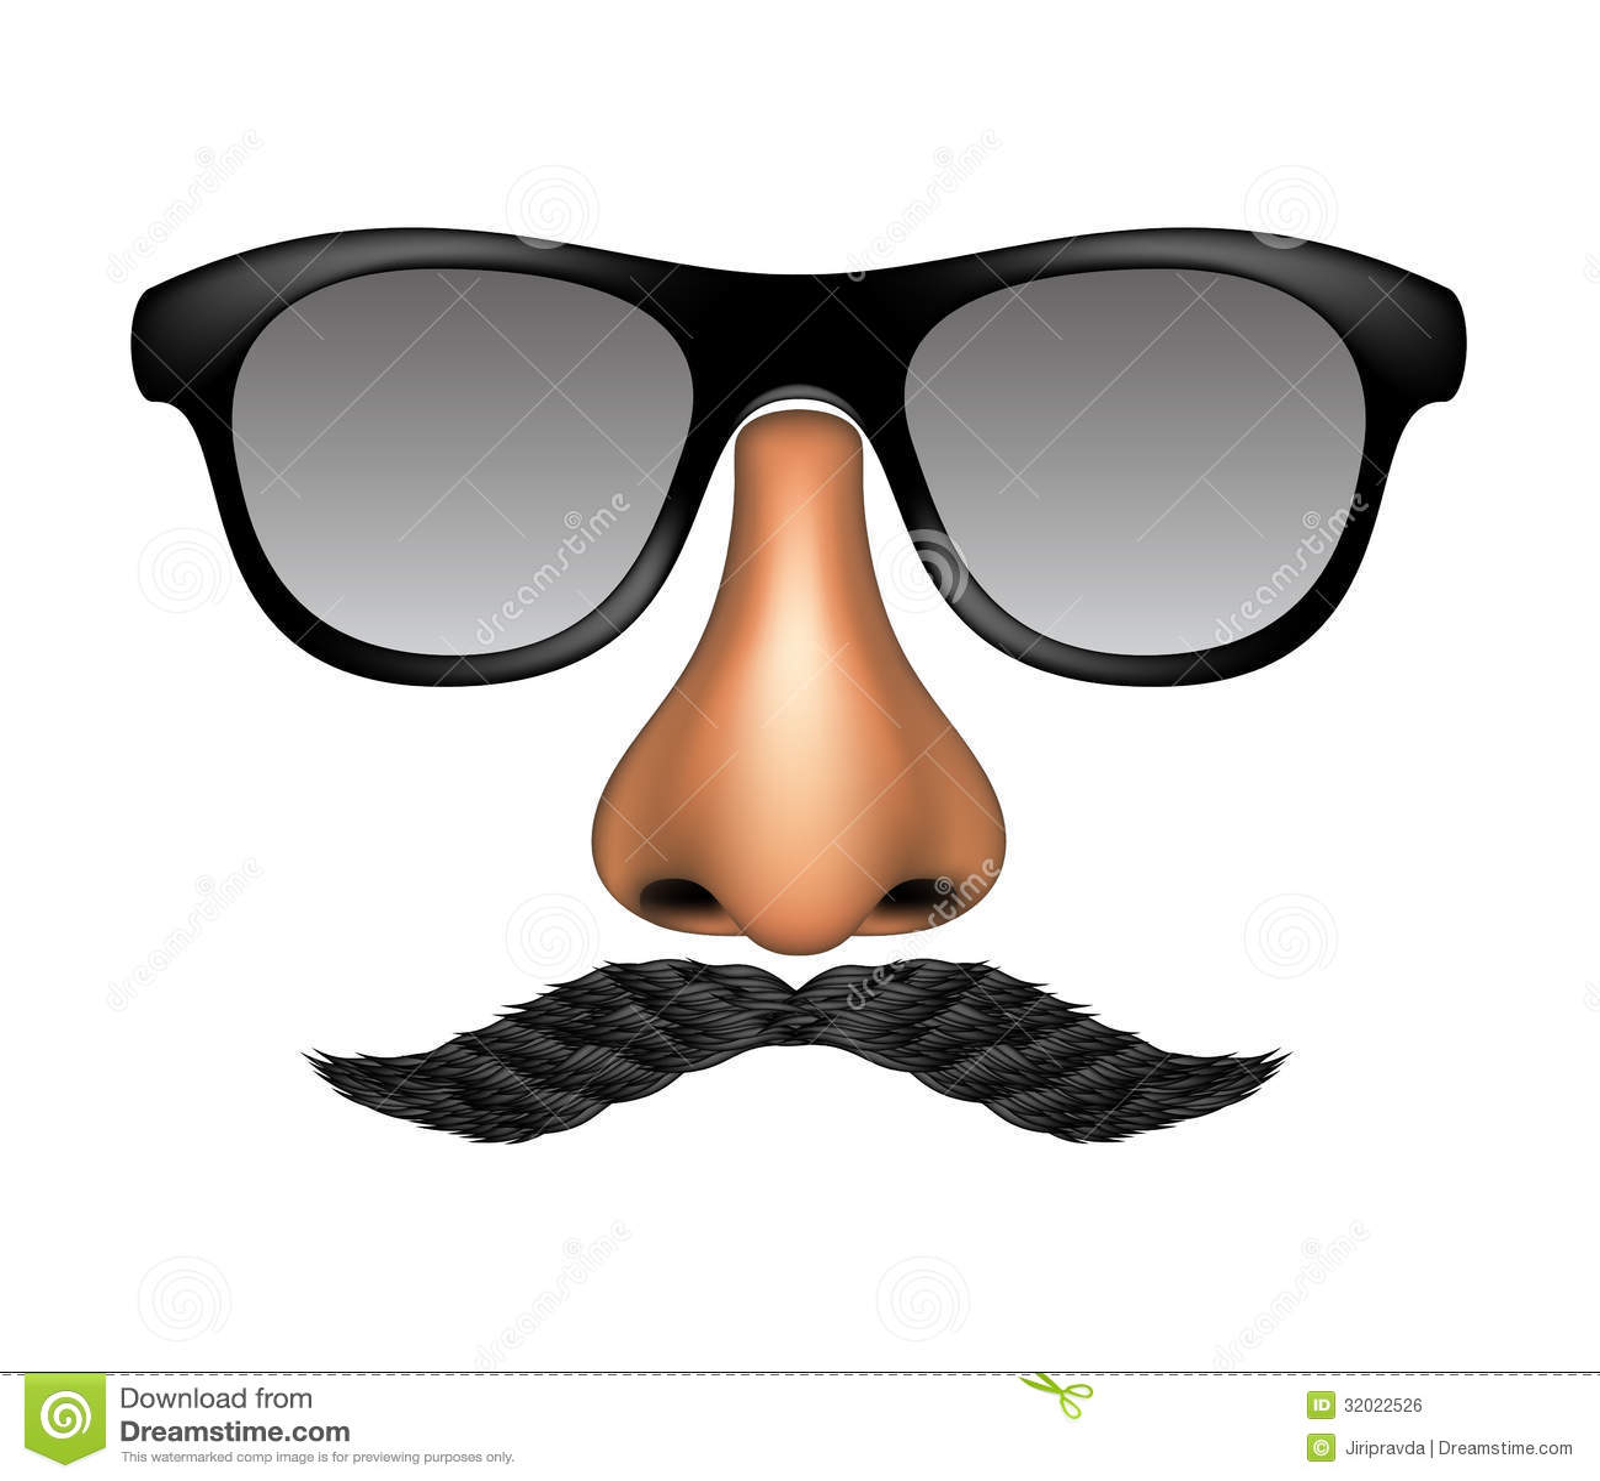 D Glasses Clipart No Background